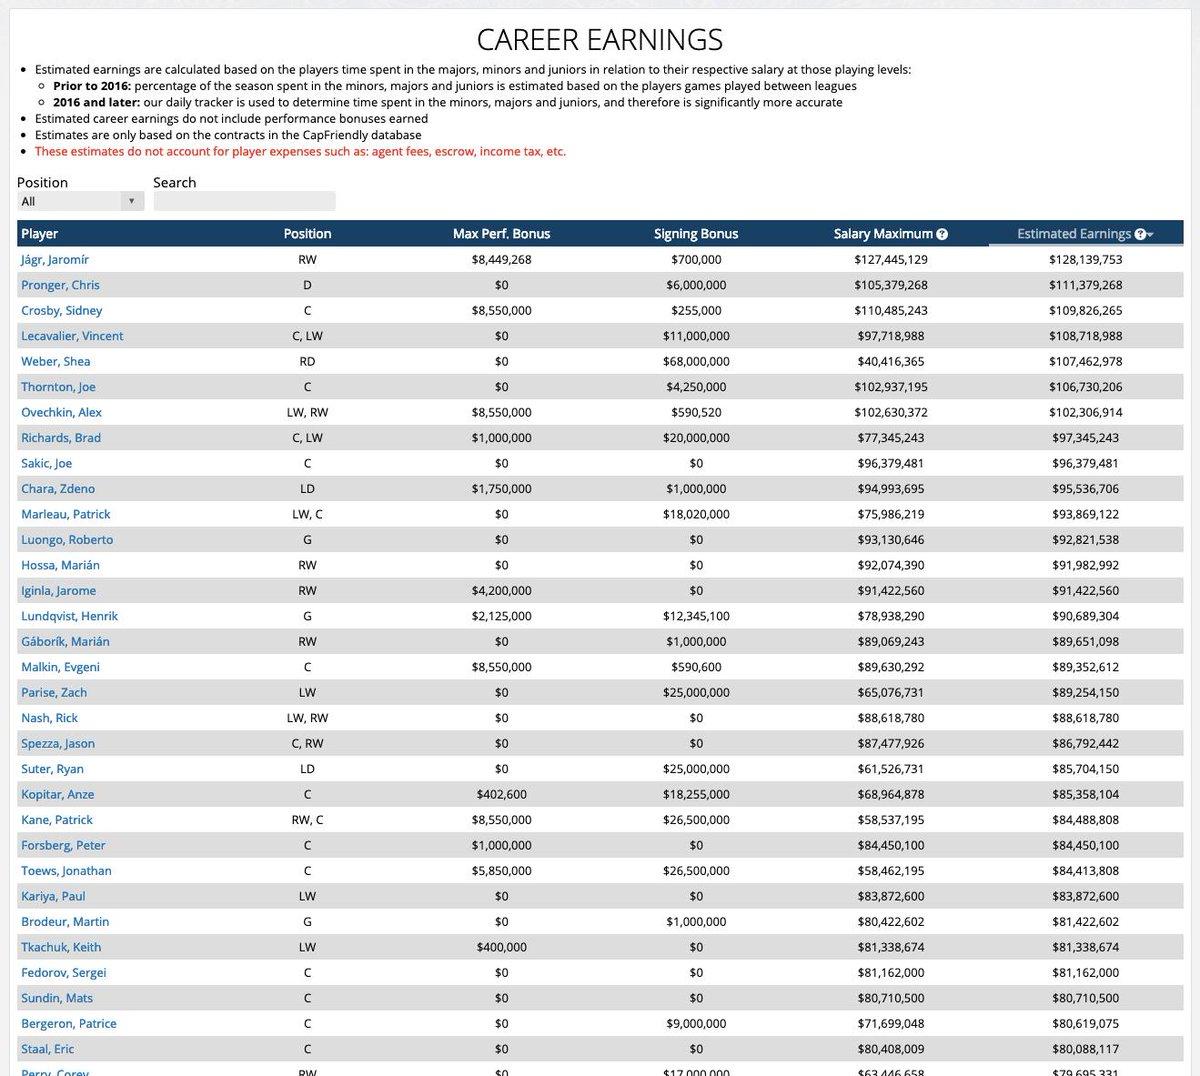 ... greatest estimated earnings is Jaromir Jagr 38d7d2b8ac8b